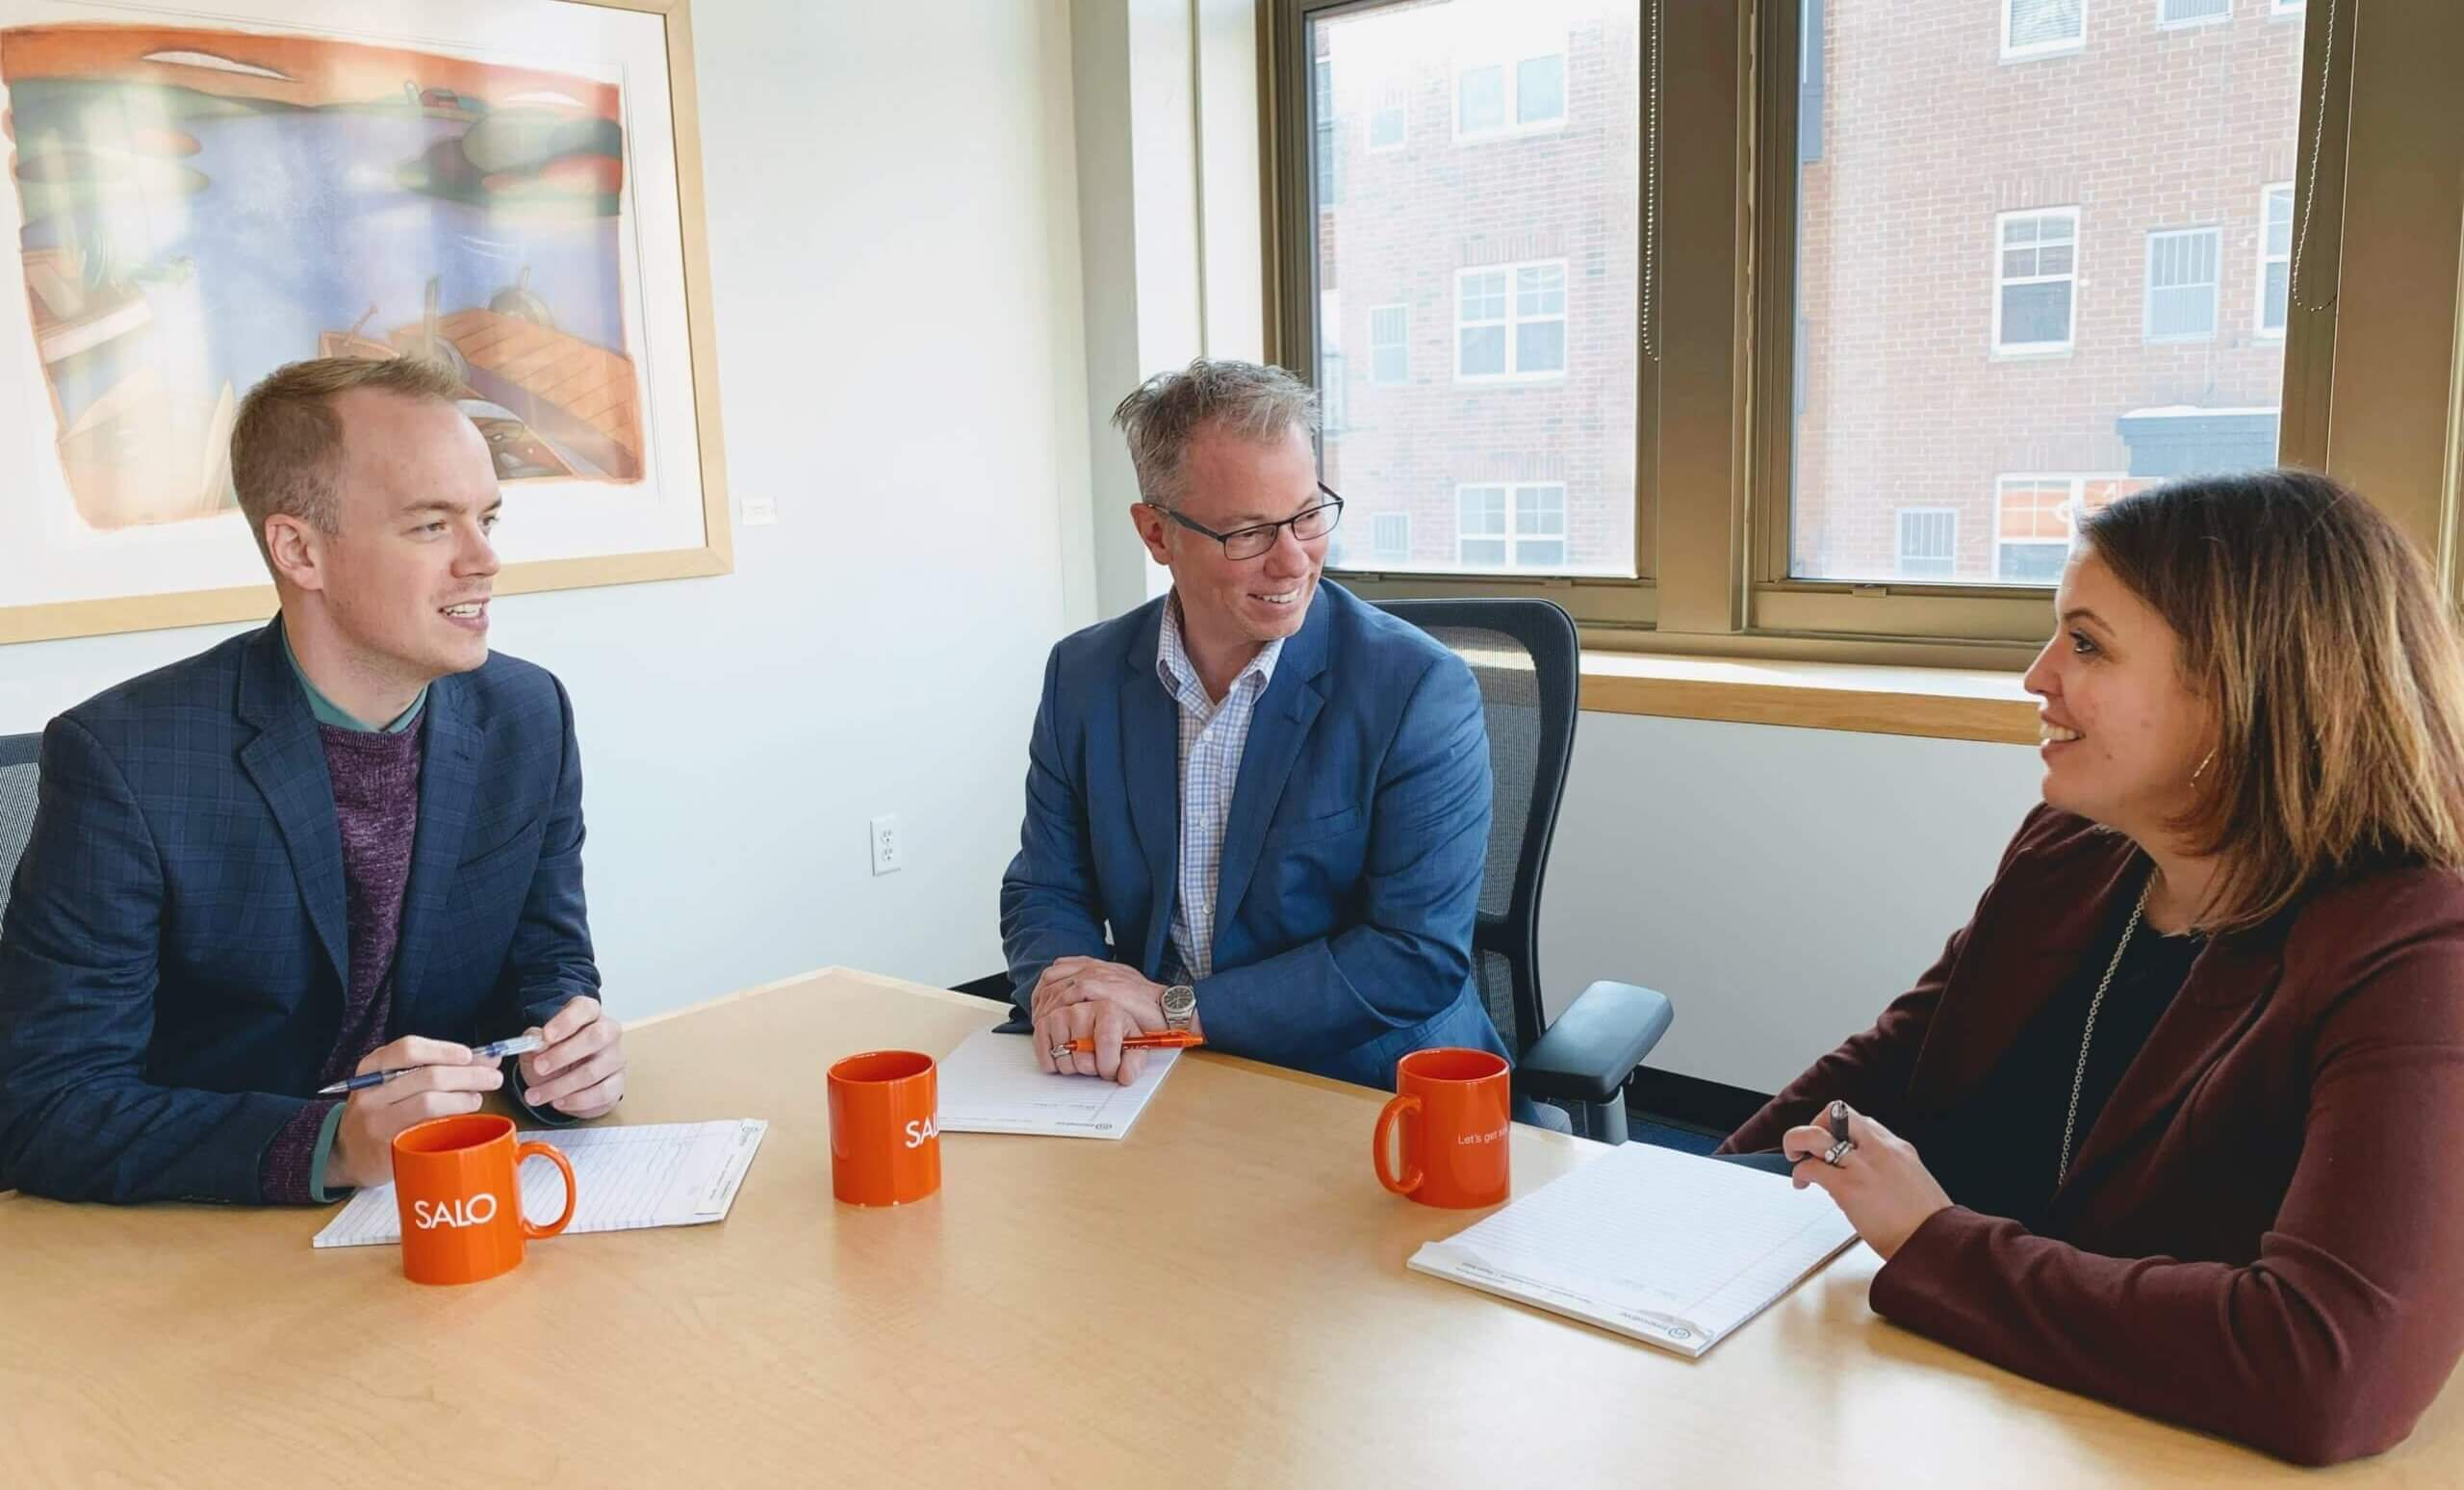 Consultant integrate into client team